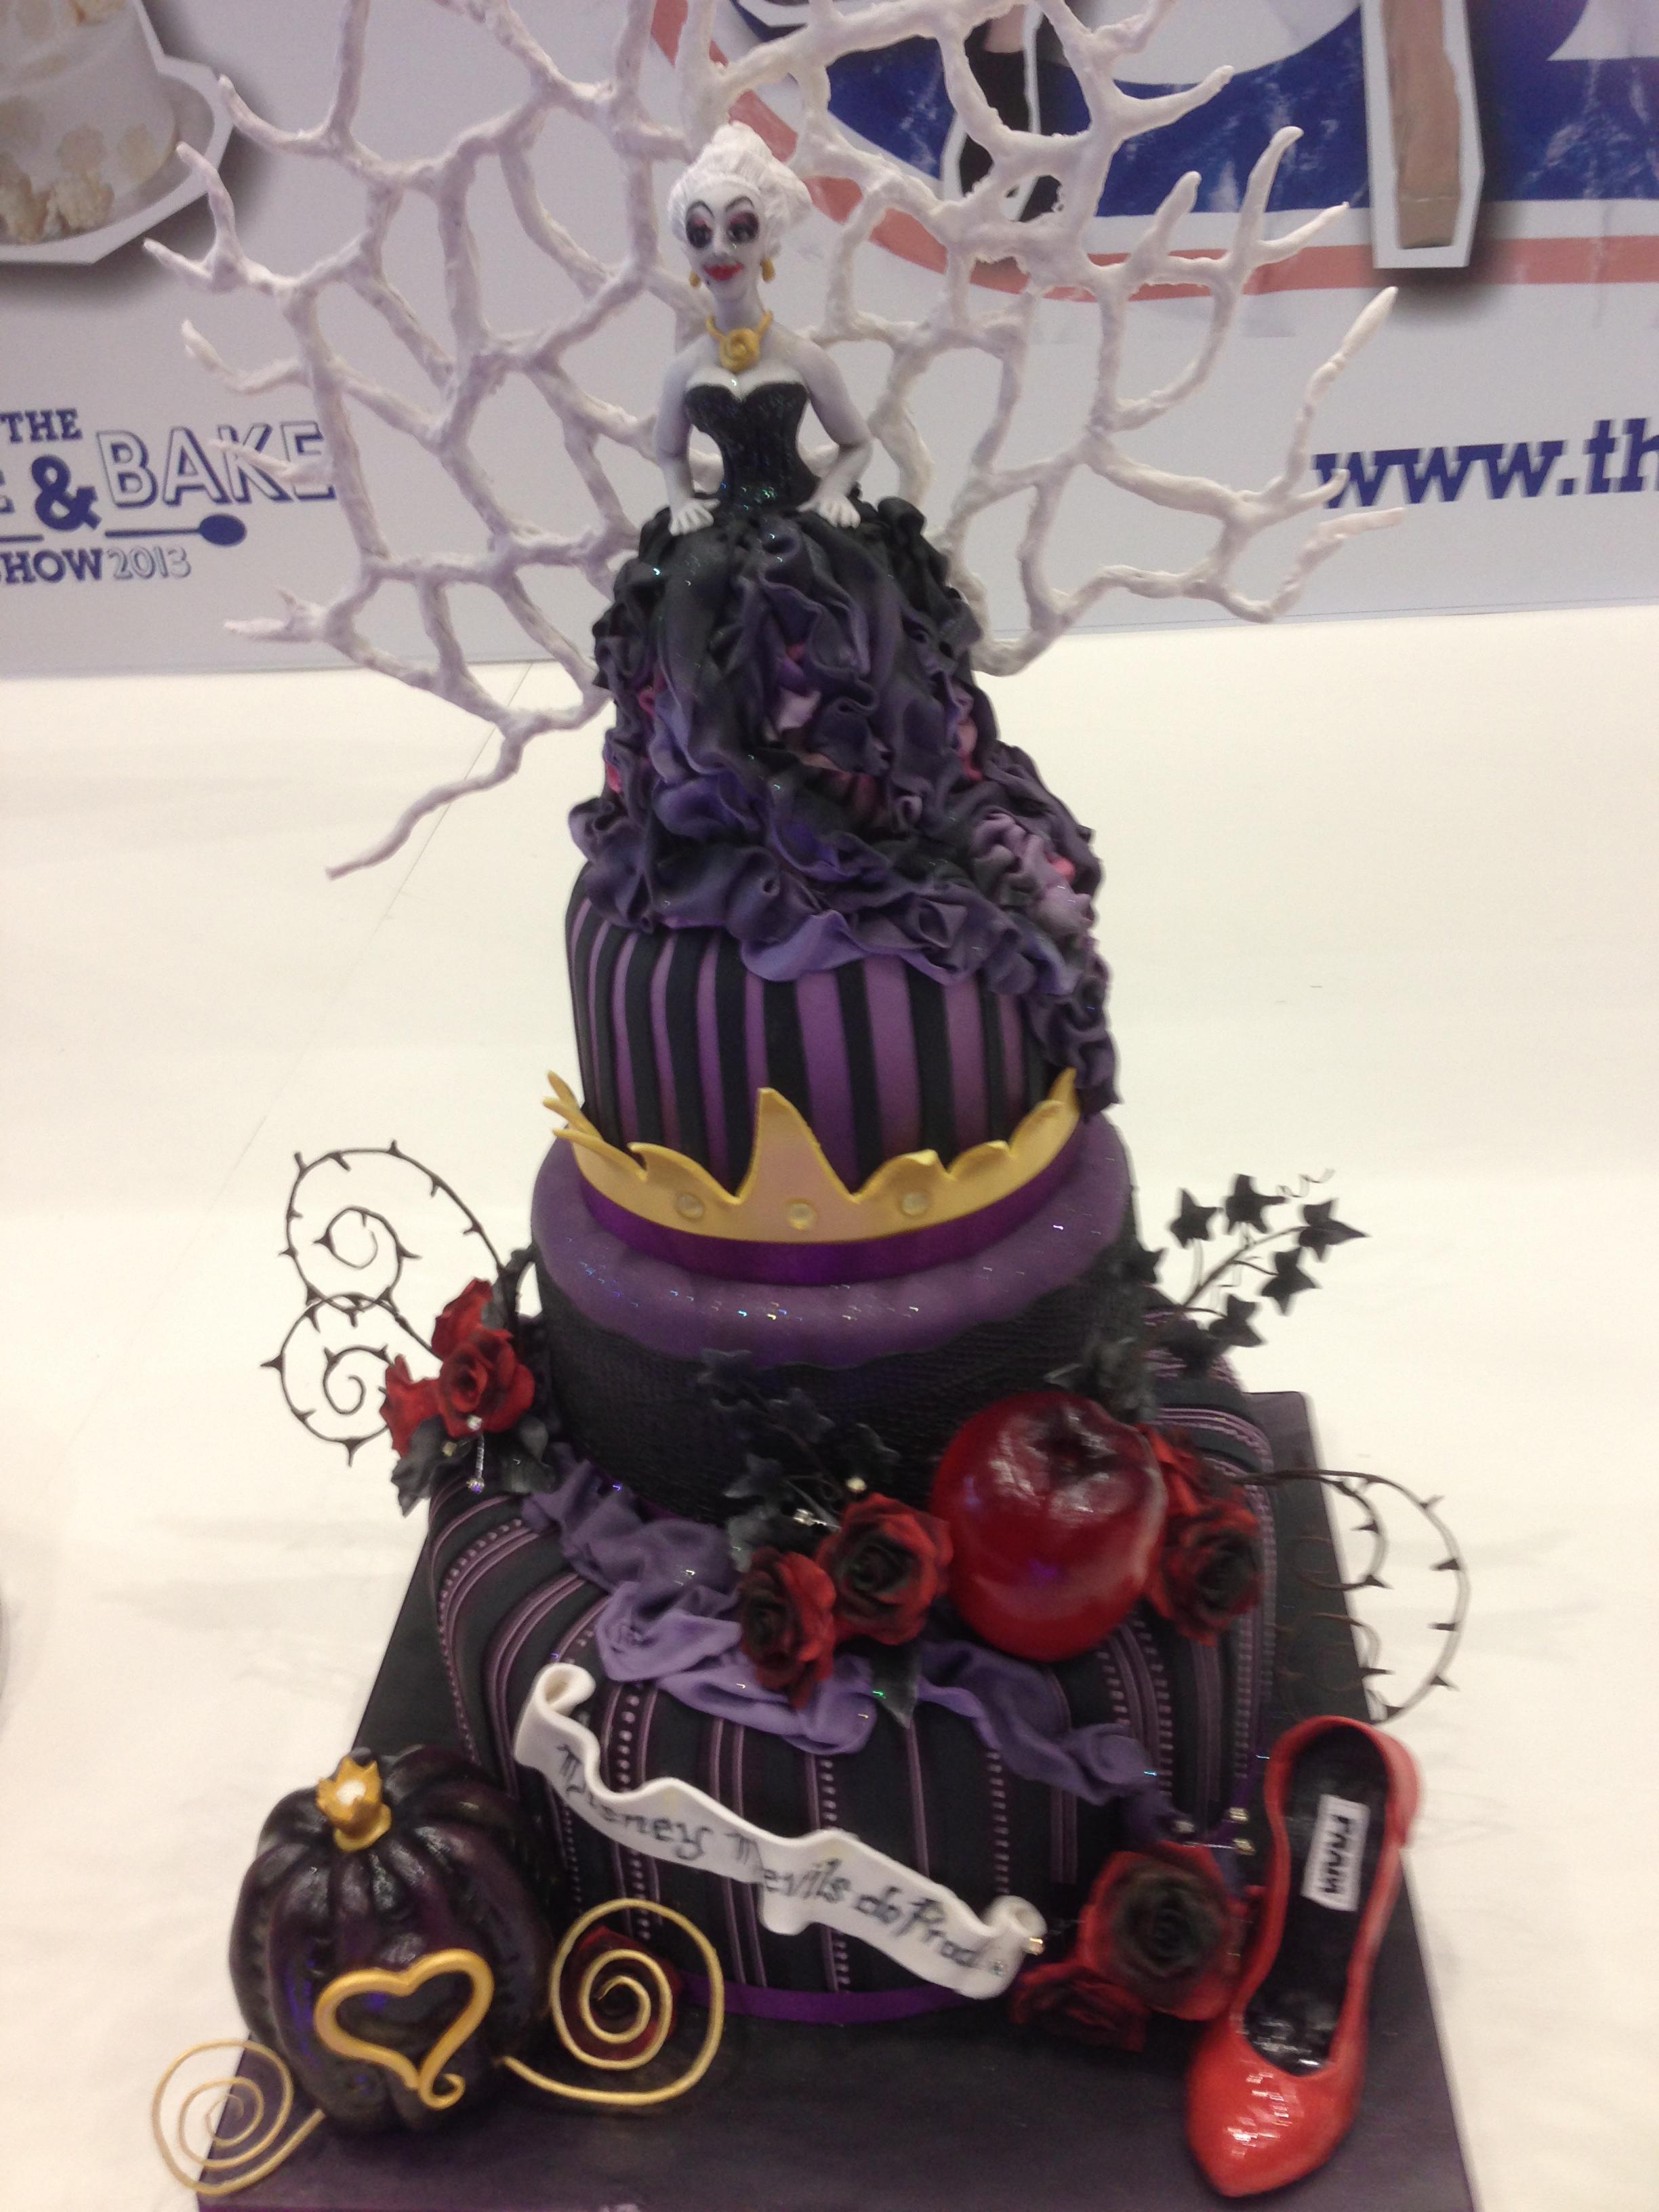 Disney Villains Birthday Cake Image Inspiration of Cake and